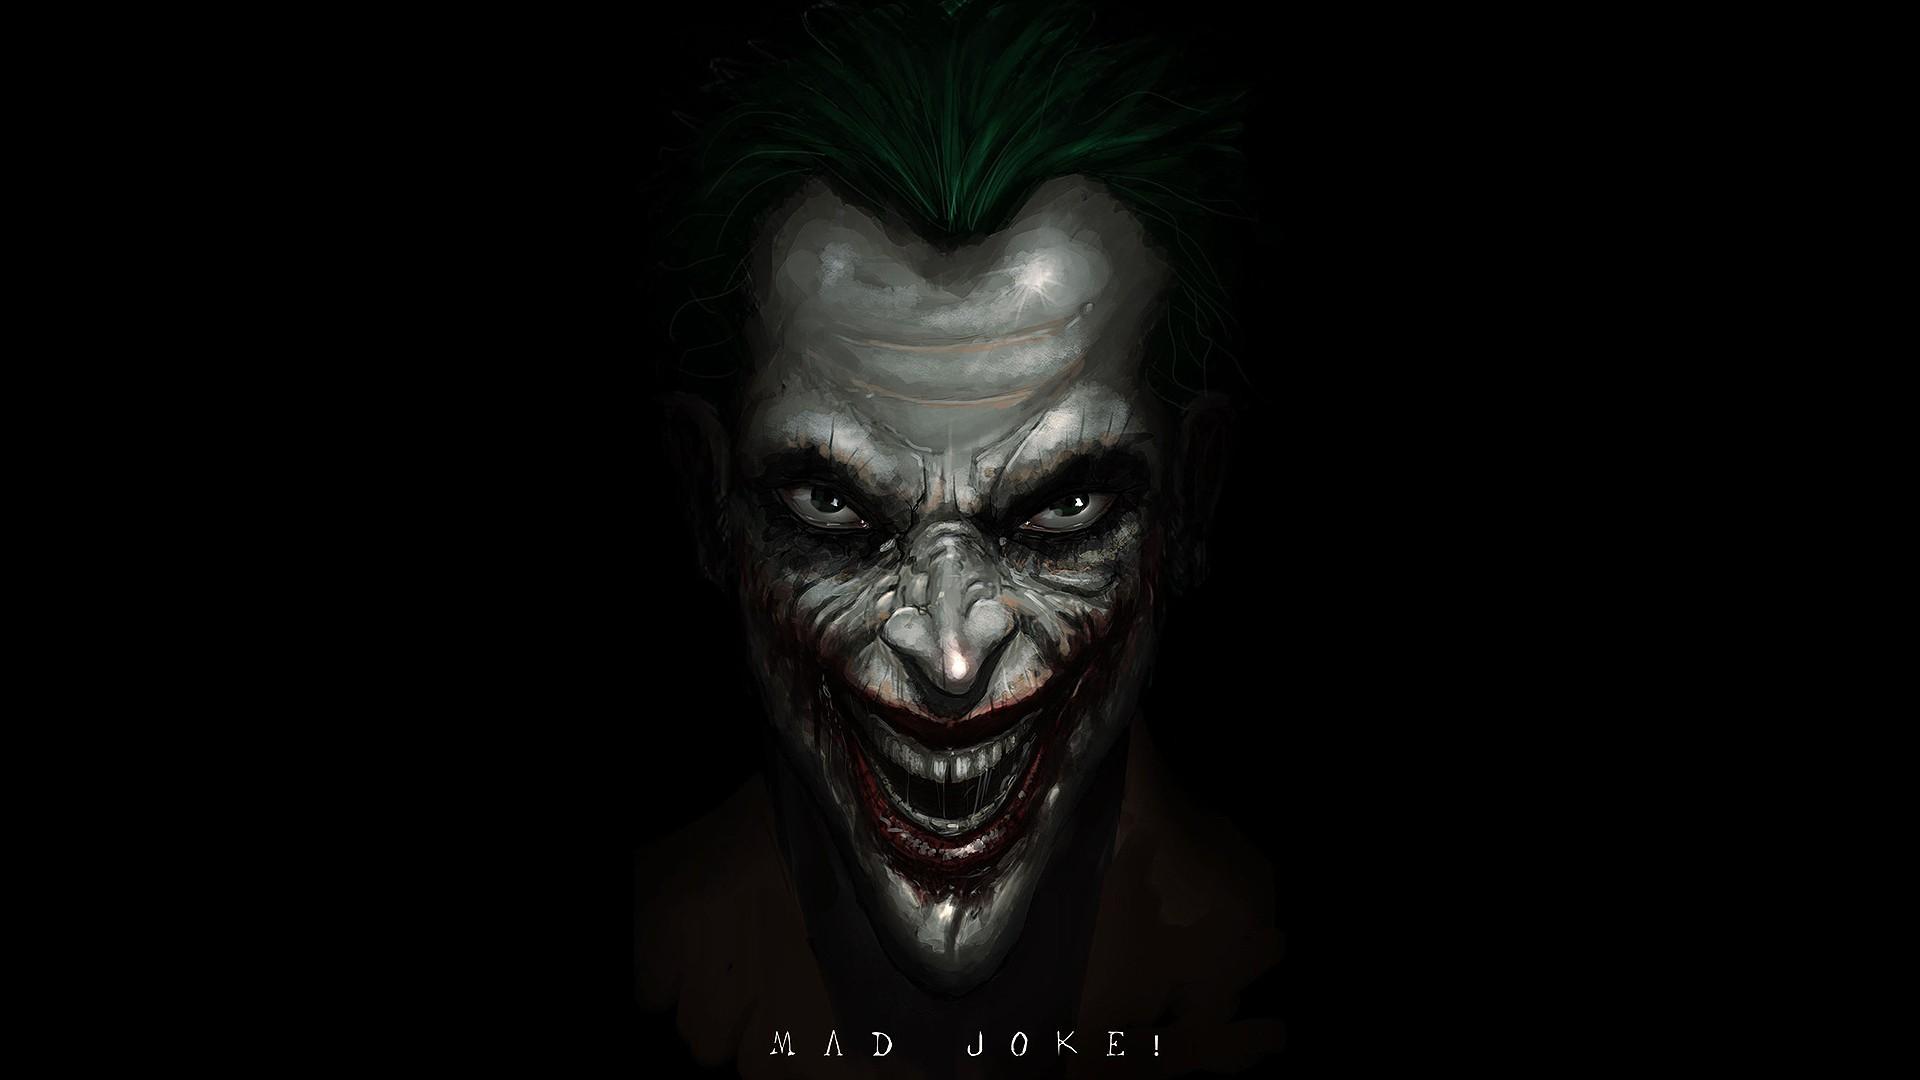 DC Comics The Joker fan art black background Wallpapers 1920x1080